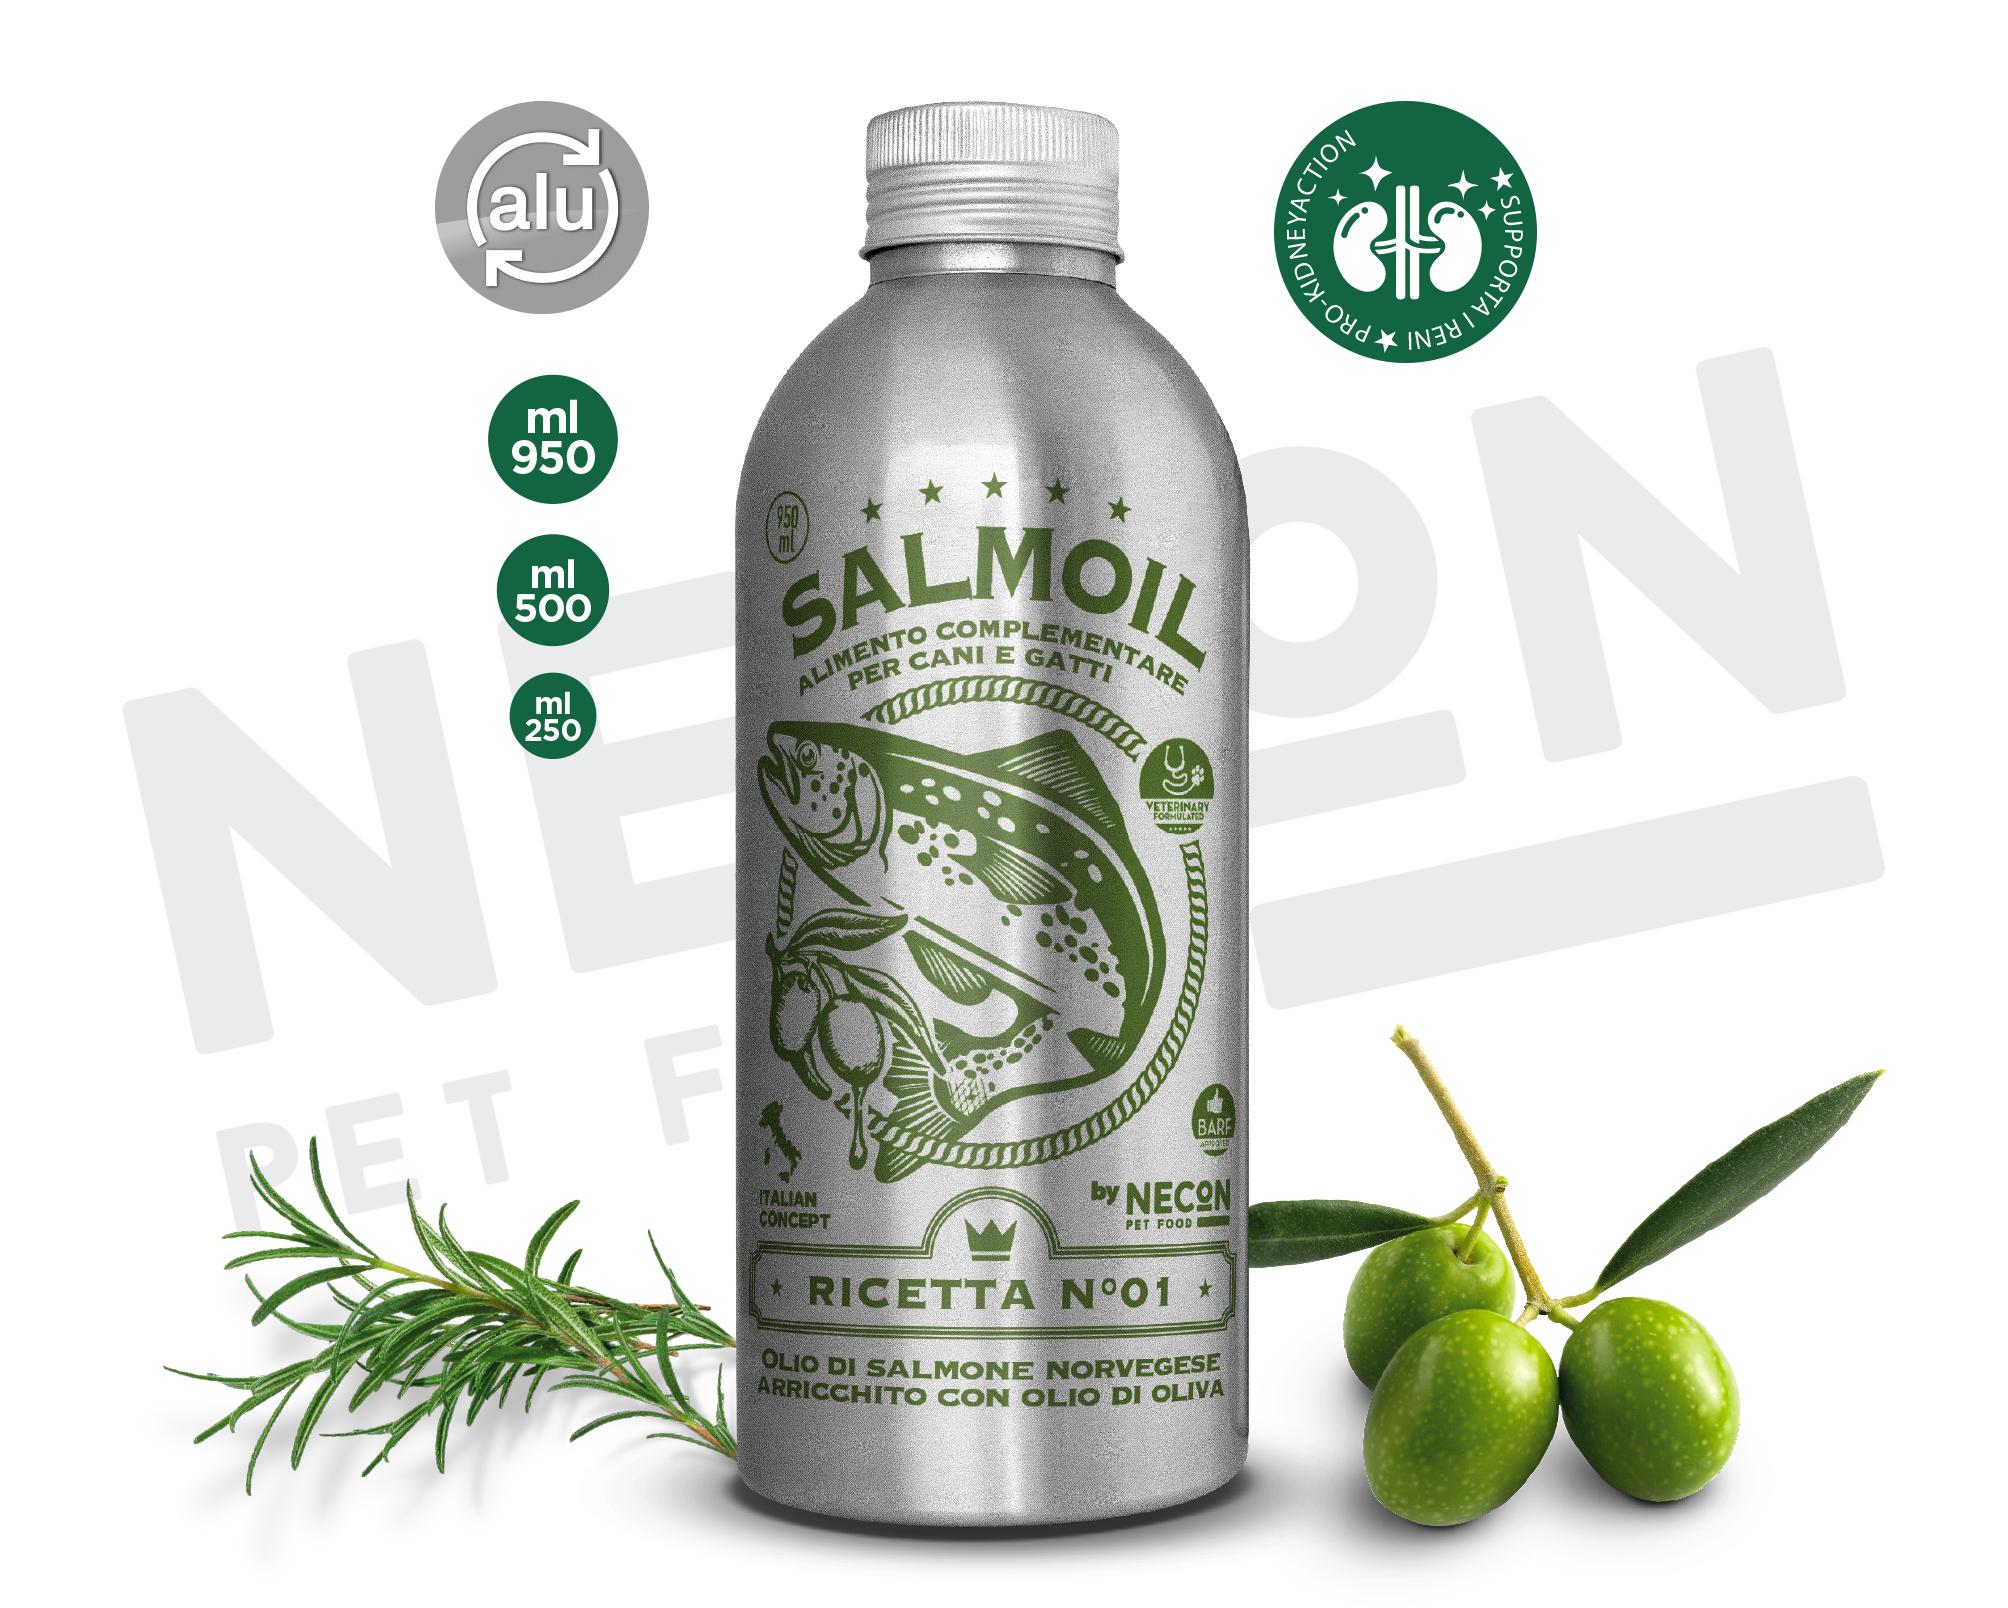 SALMOIL RICETTA n° 1 OLIO DI SALMONE